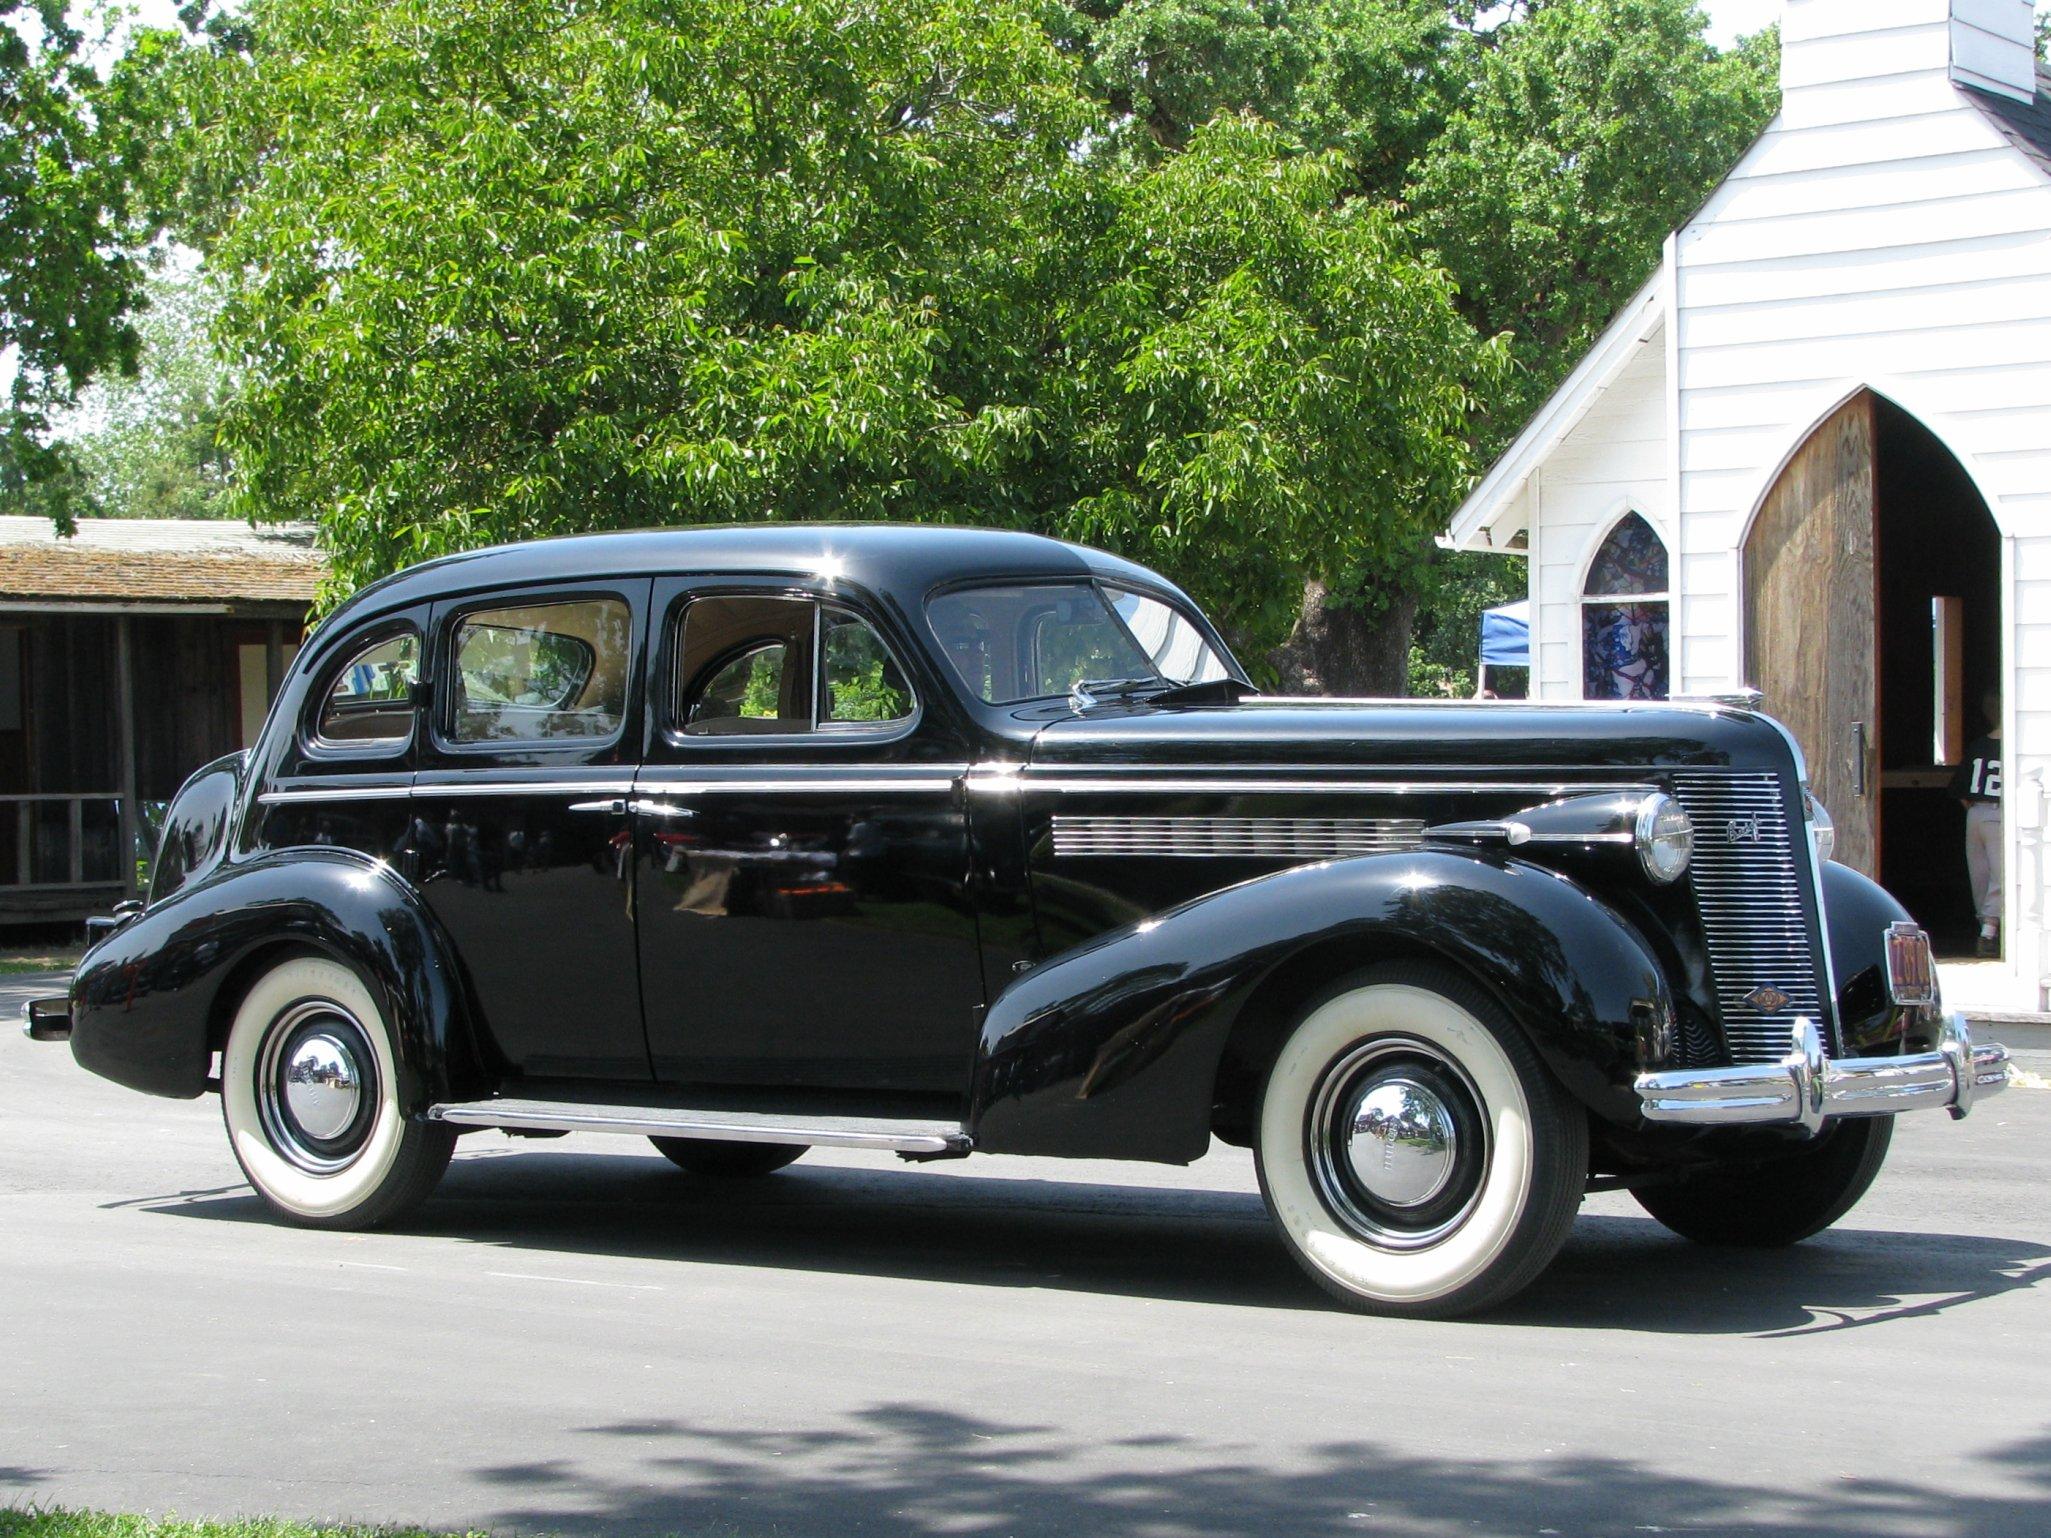 1937 buick 4 door sedan 39 1z 88 09 39 2 flickr photo sharing for 1937 buick 4 door sedan